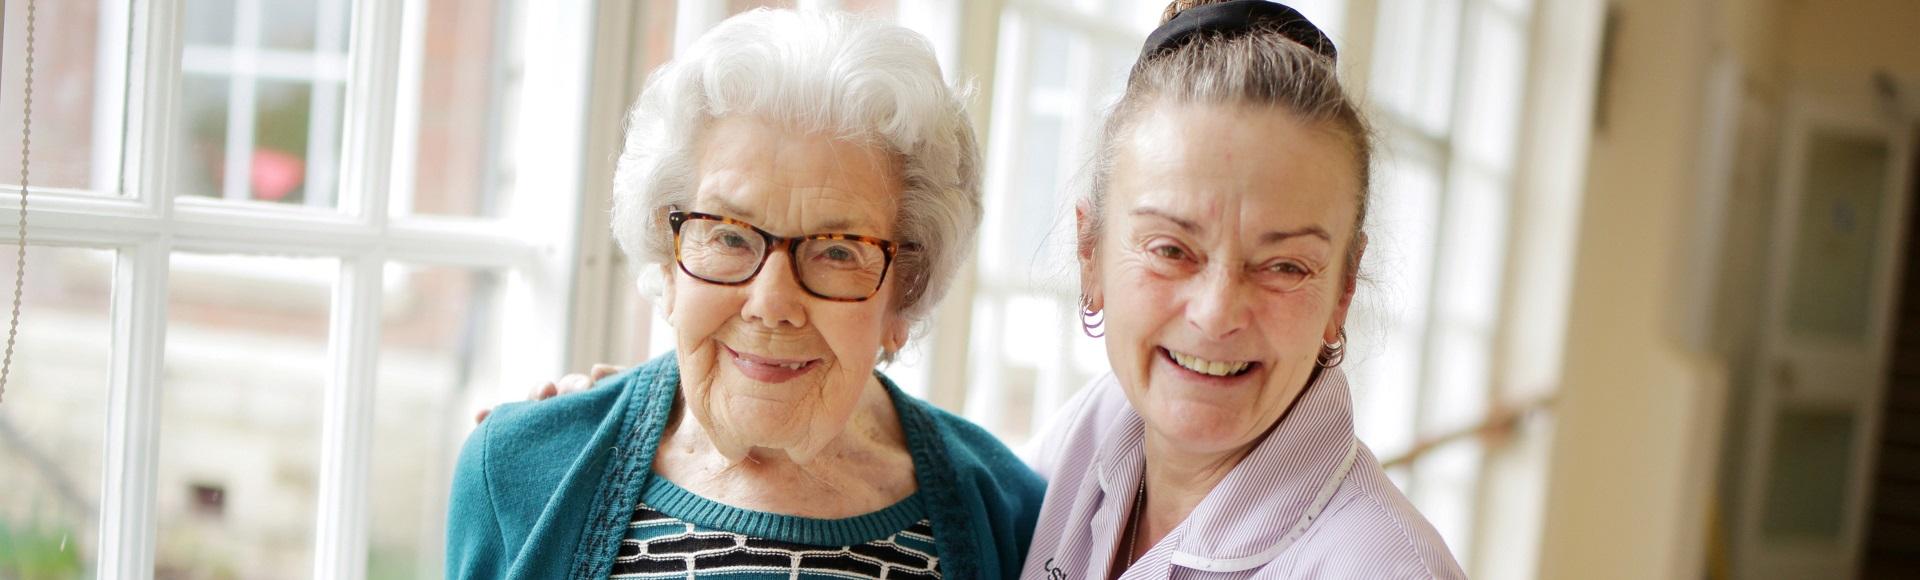 Greensleeves Care Values set us apart